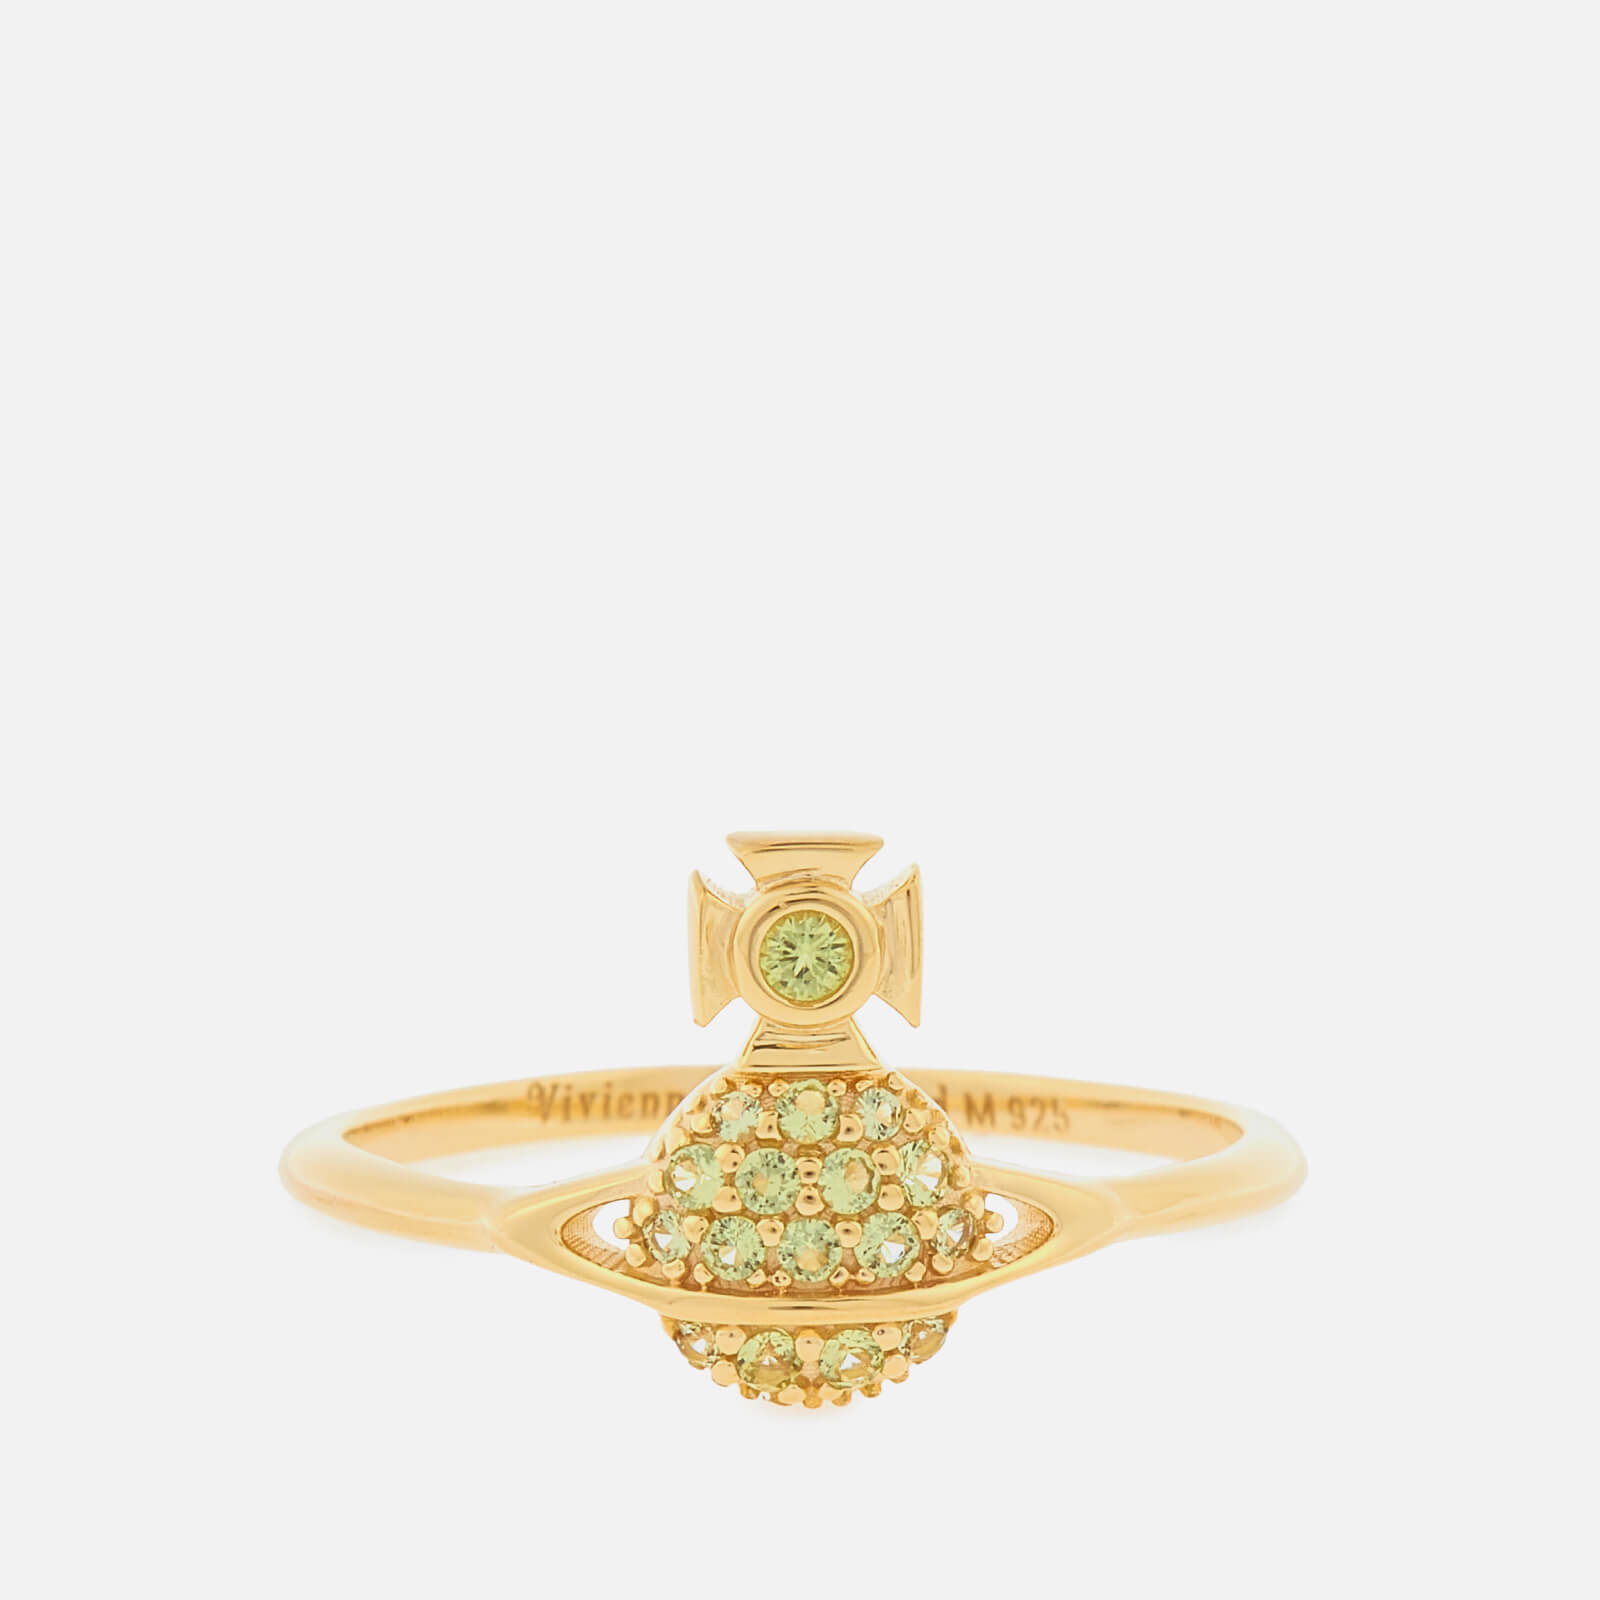 Vivienne Westwood Women's Tamia Ring - Gold Peridot